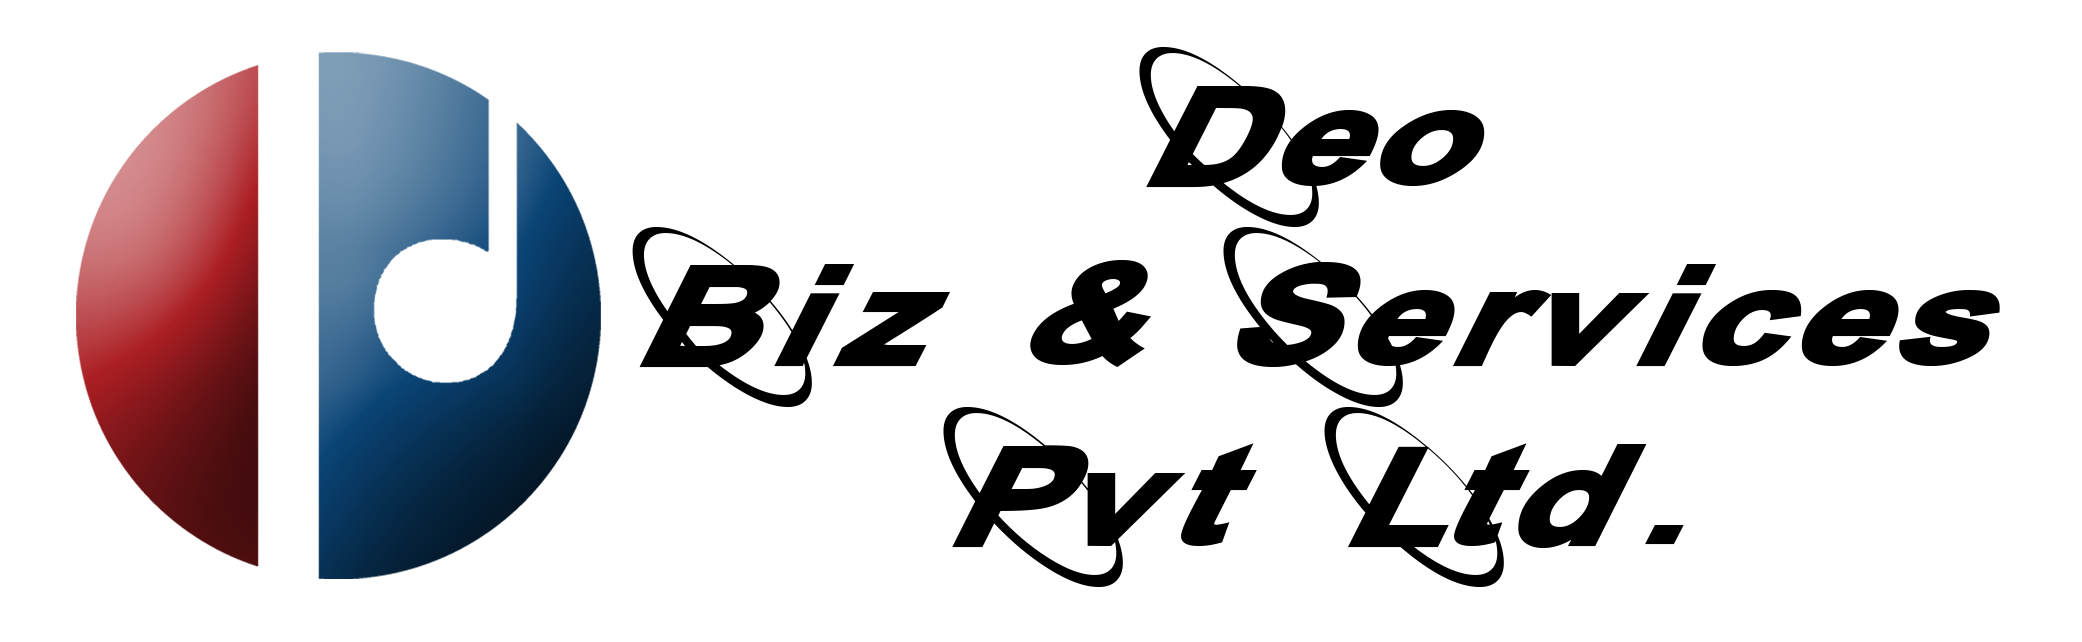 Deo Biz & Services Pvt Ltd. Logo full